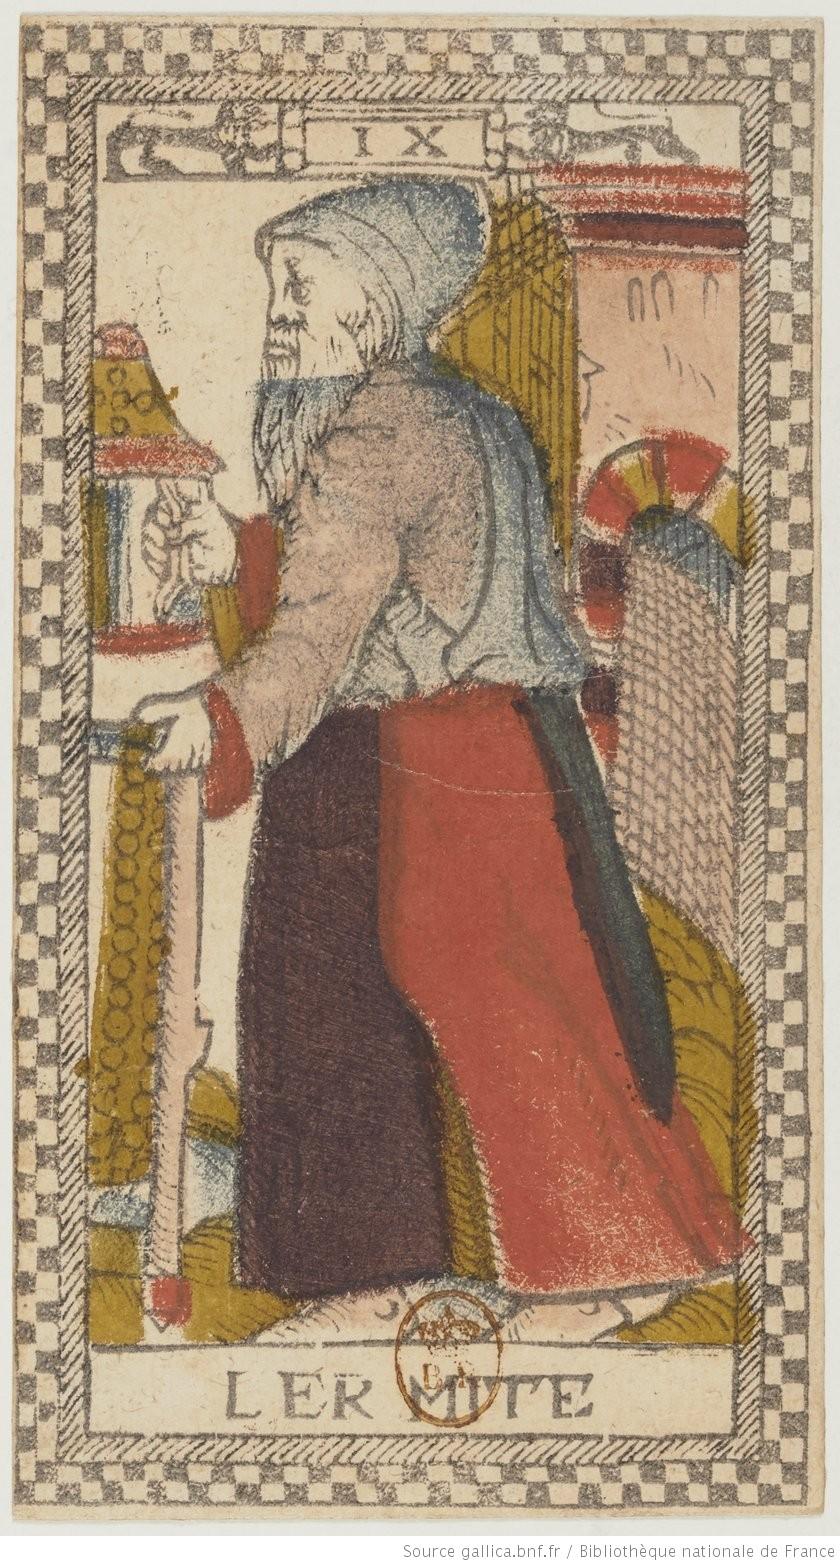 http://gallica.bnf.fr/ark:/12148/btv1b105109624/f17.highres